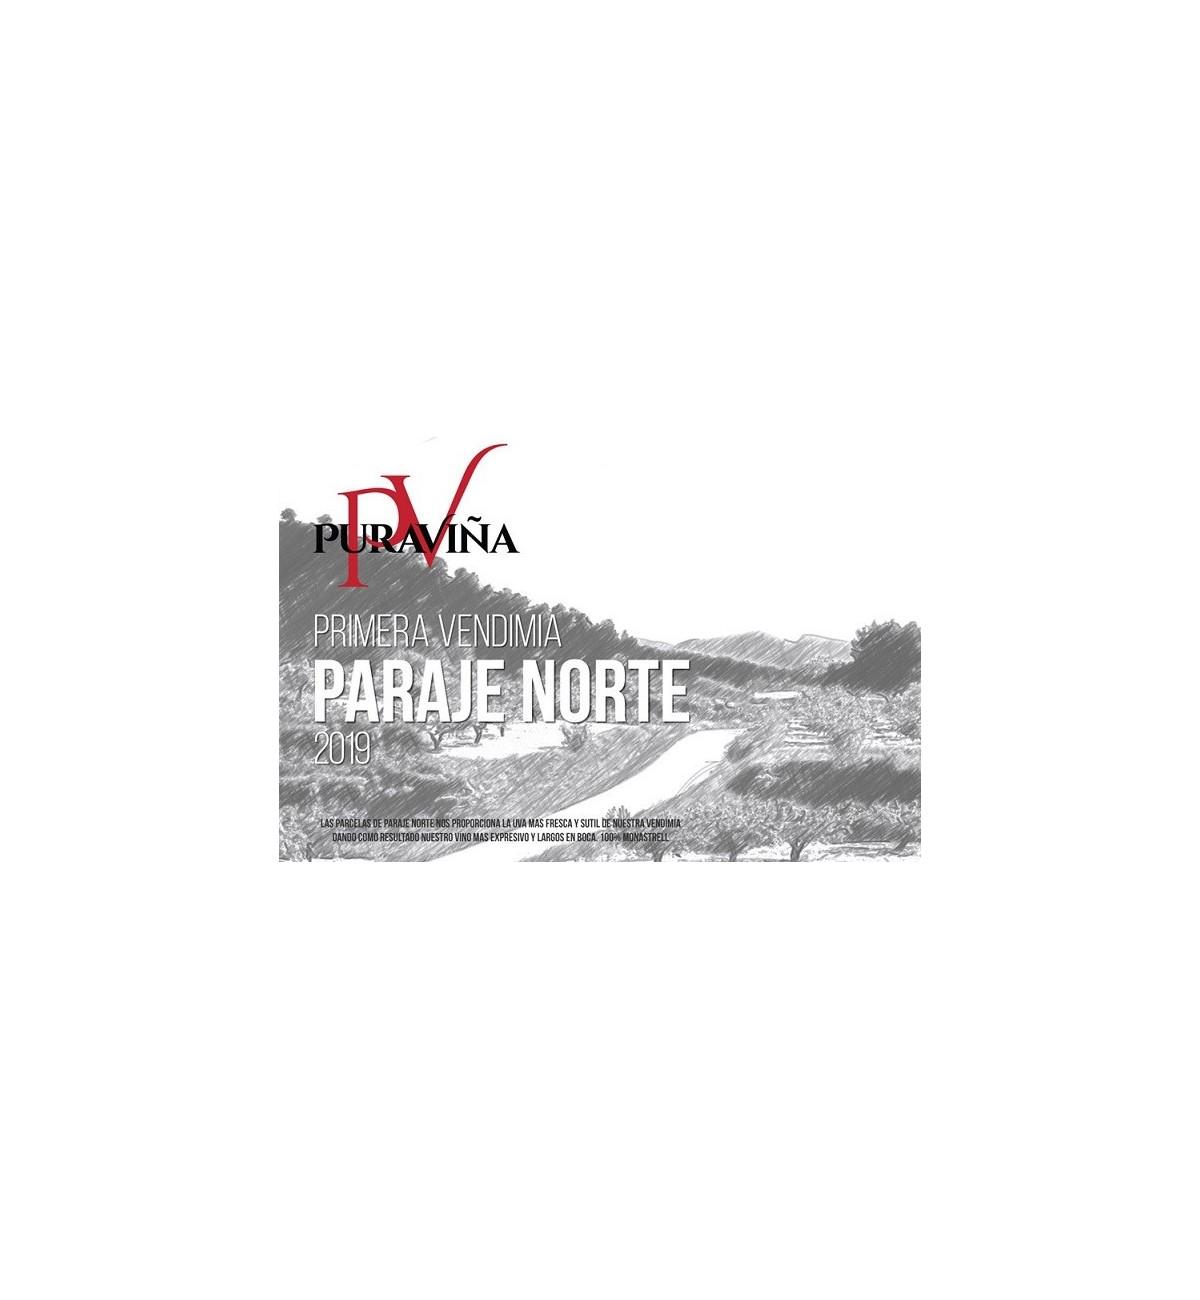 Pura Viña Paraje Norte 2019, Vino tinto, Monastrell